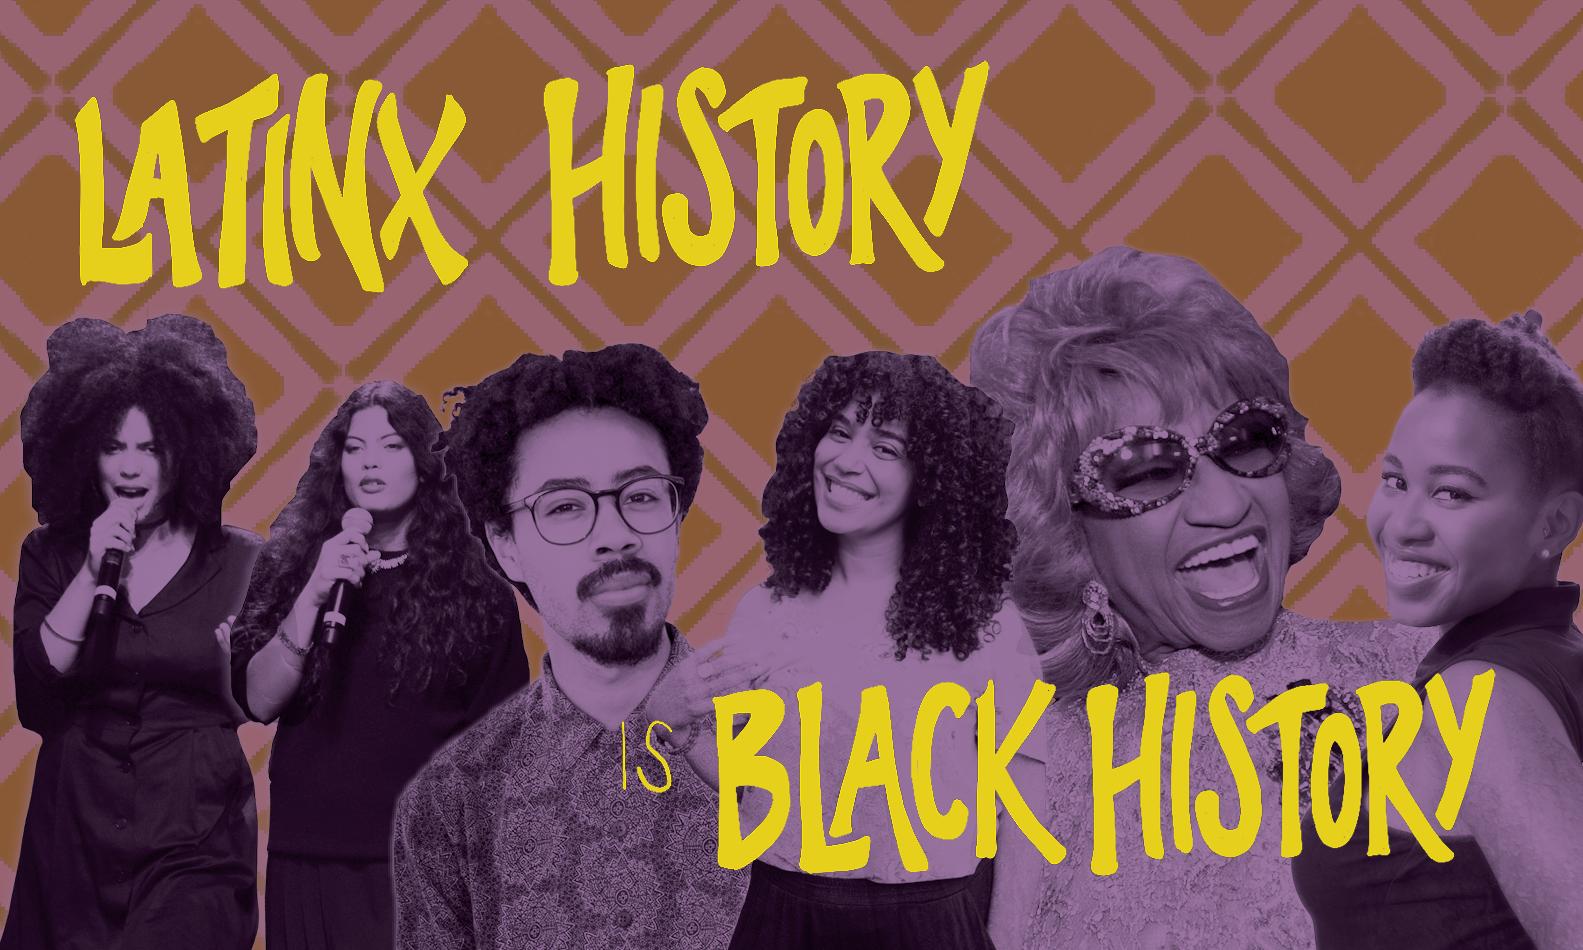 Latinx History is Black History webinar pic